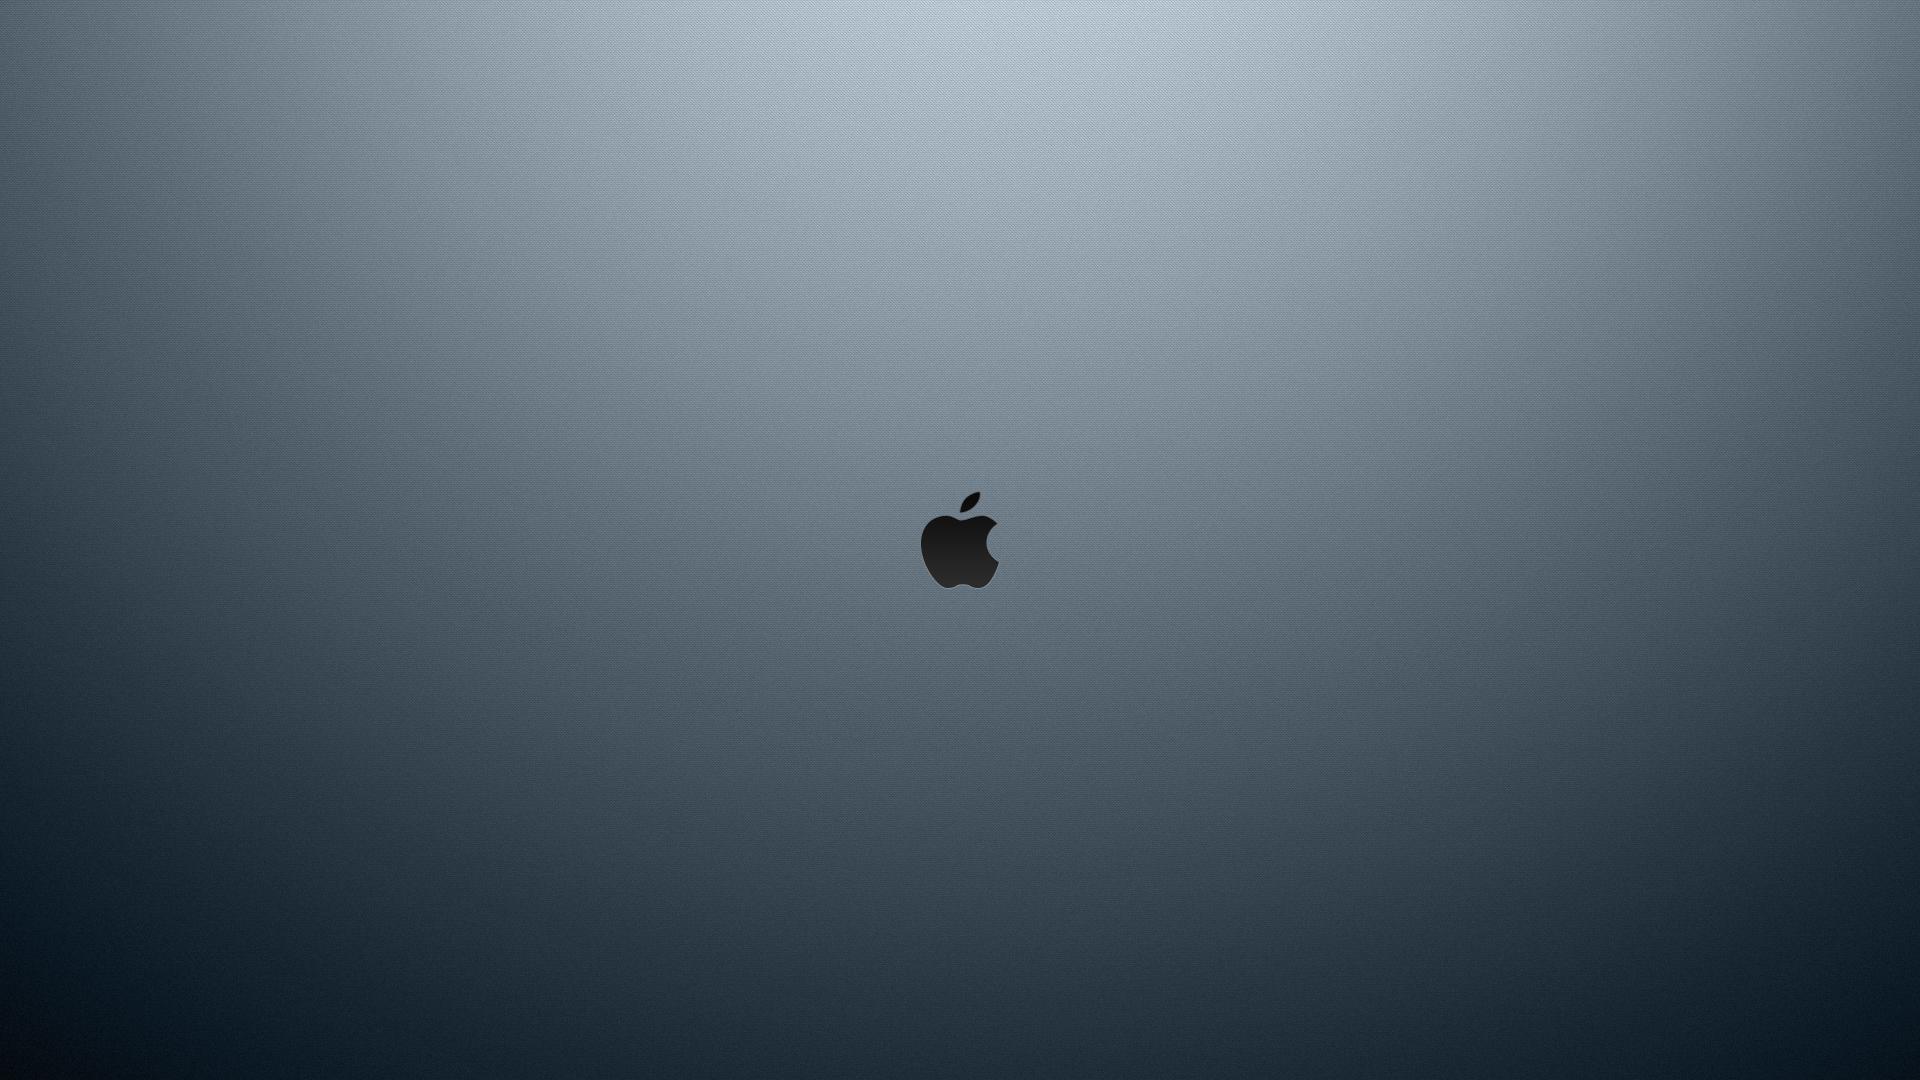 Download apple os x gradient wallpaper HD wallpaper 1920x1080